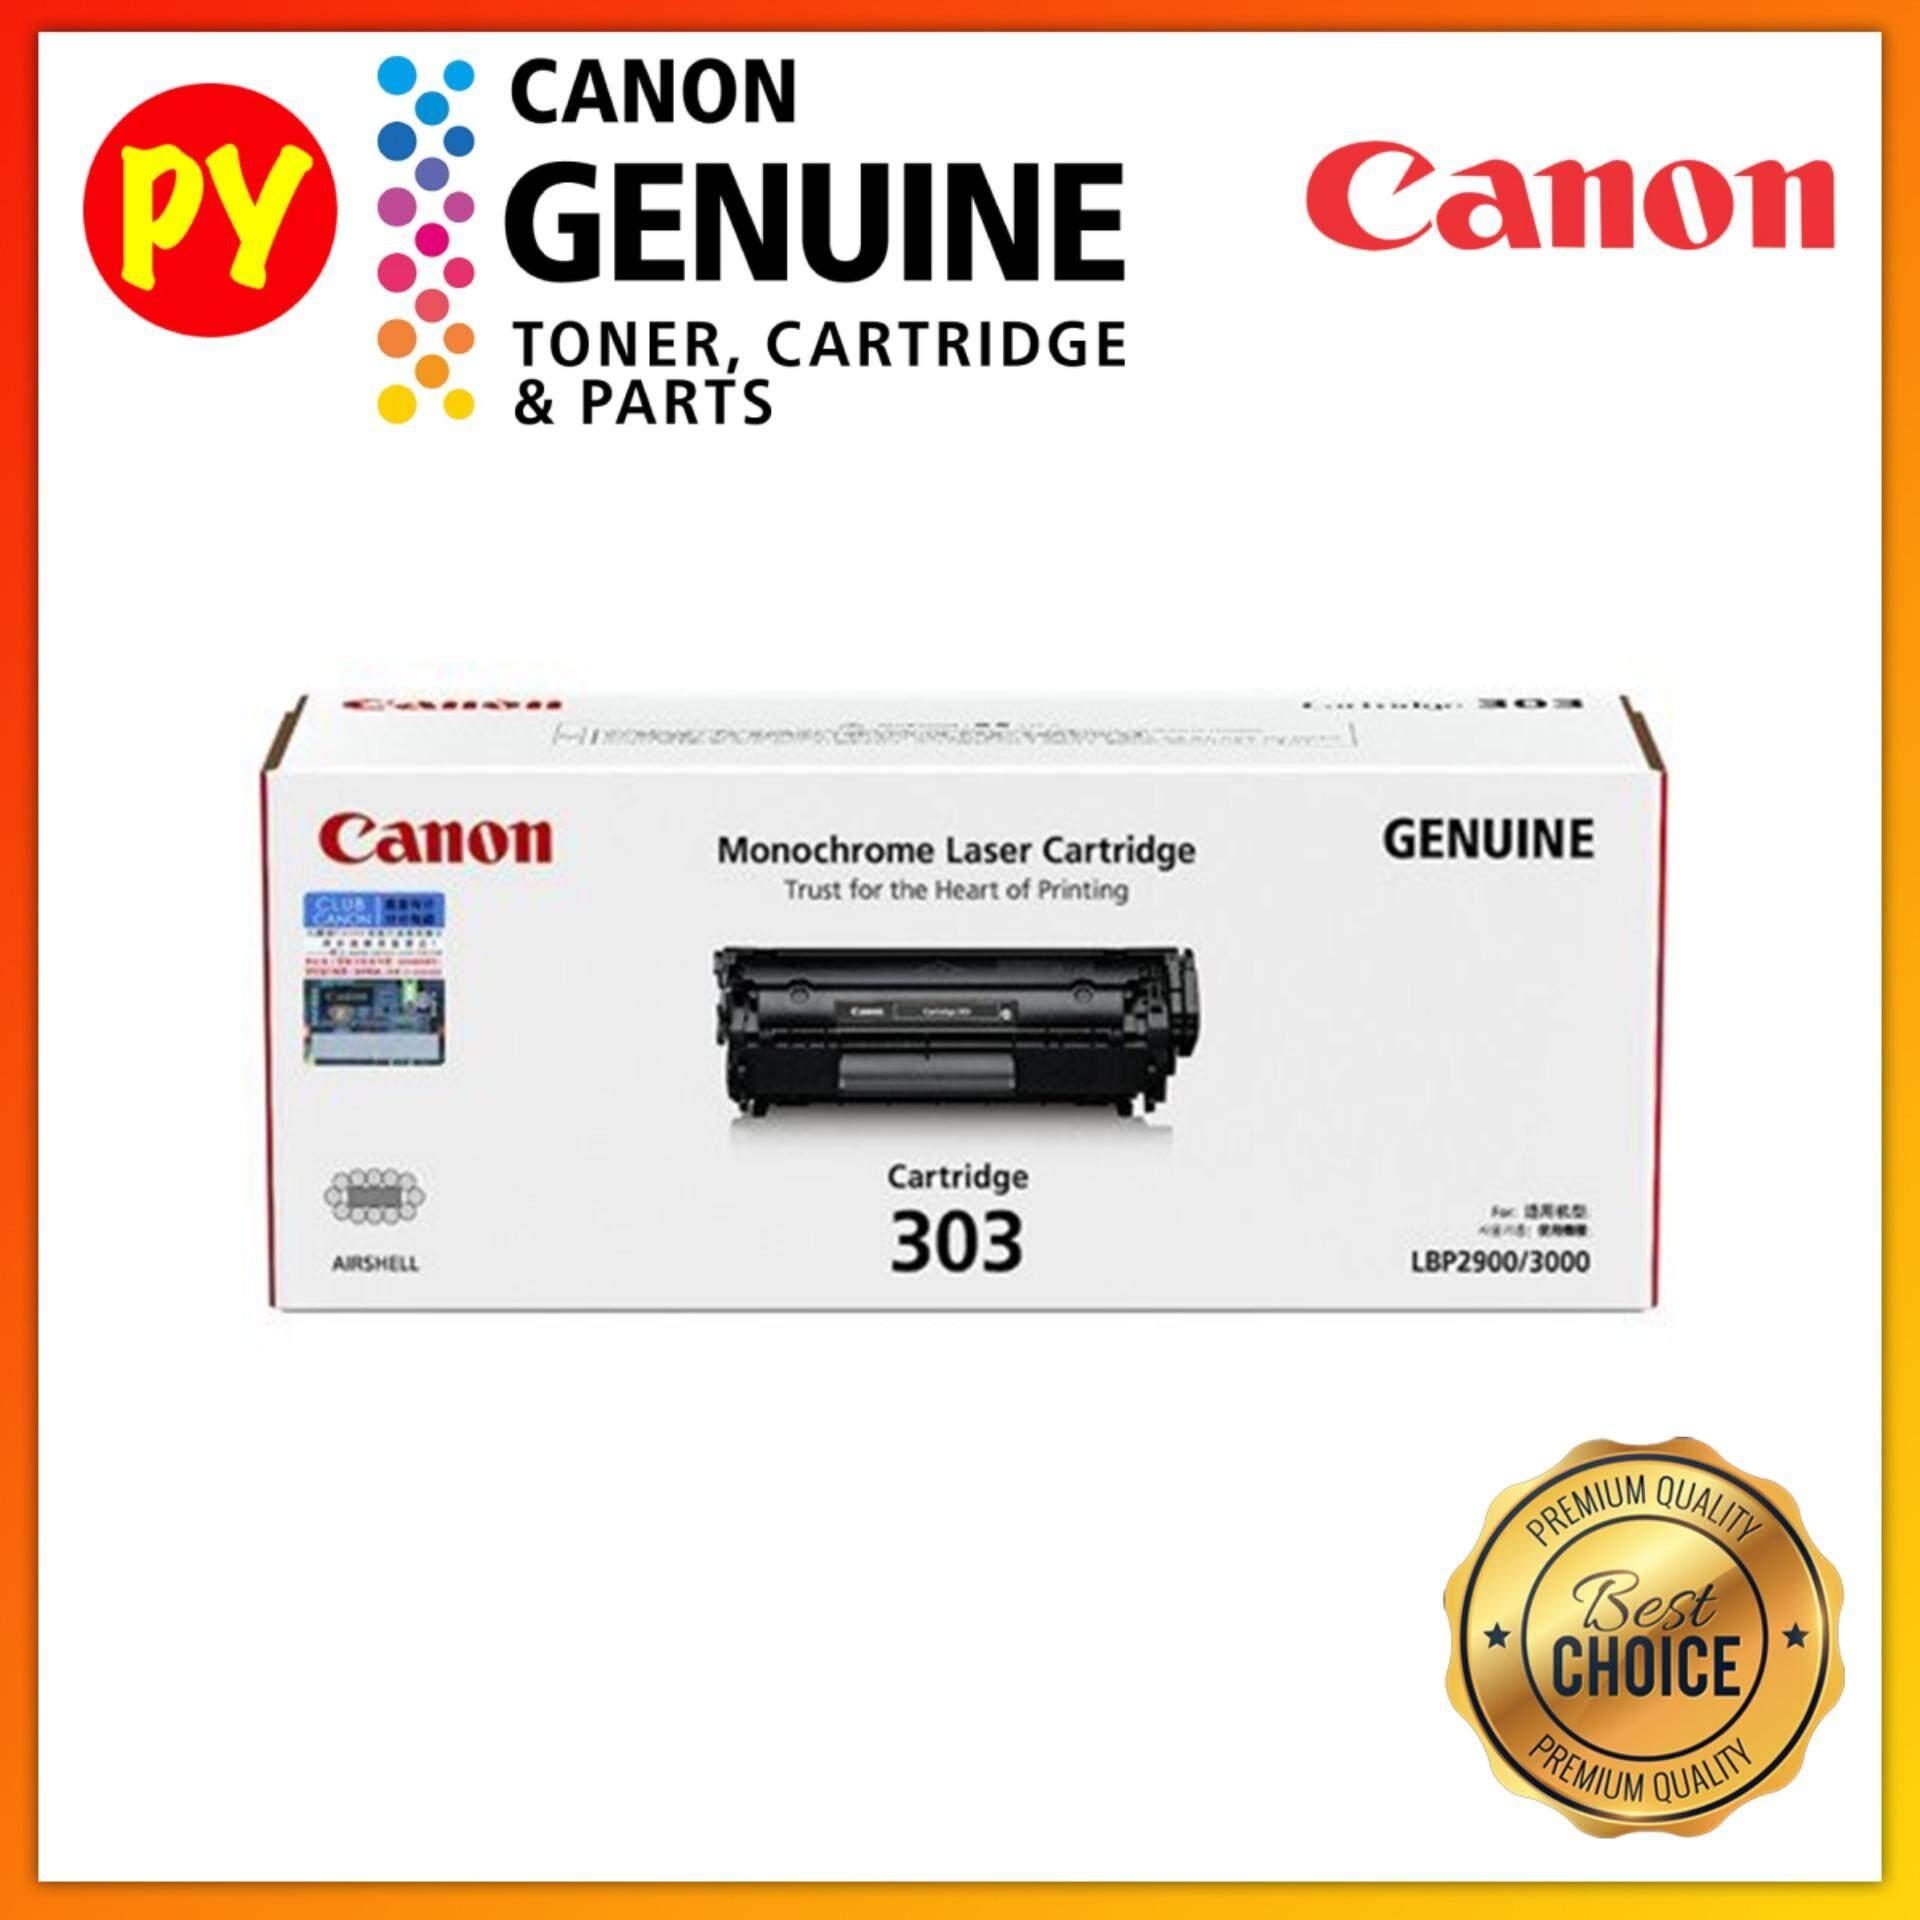 Canon Cartridge 303 Black Original Laser Toner - for LBP-2900 / LBP-3000